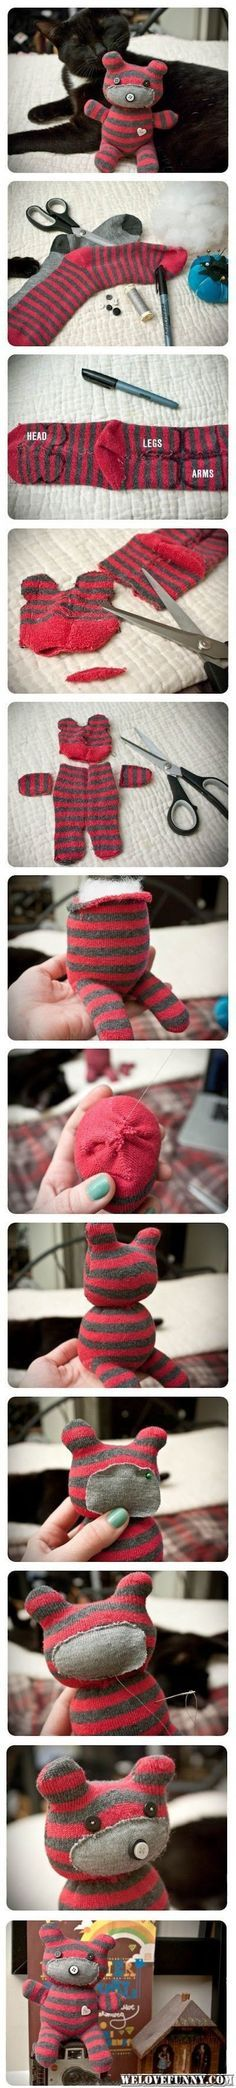 Çoraptan Oyuncak Modelleri ve Yapımı beautiful cutest funny wild basteln lustig zeichnen Kids Crafts, Sock Crafts, Cute Crafts, Crafts To Do, Fabric Crafts, Sewing Crafts, Sewing Projects, Craft Projects, Arts And Crafts